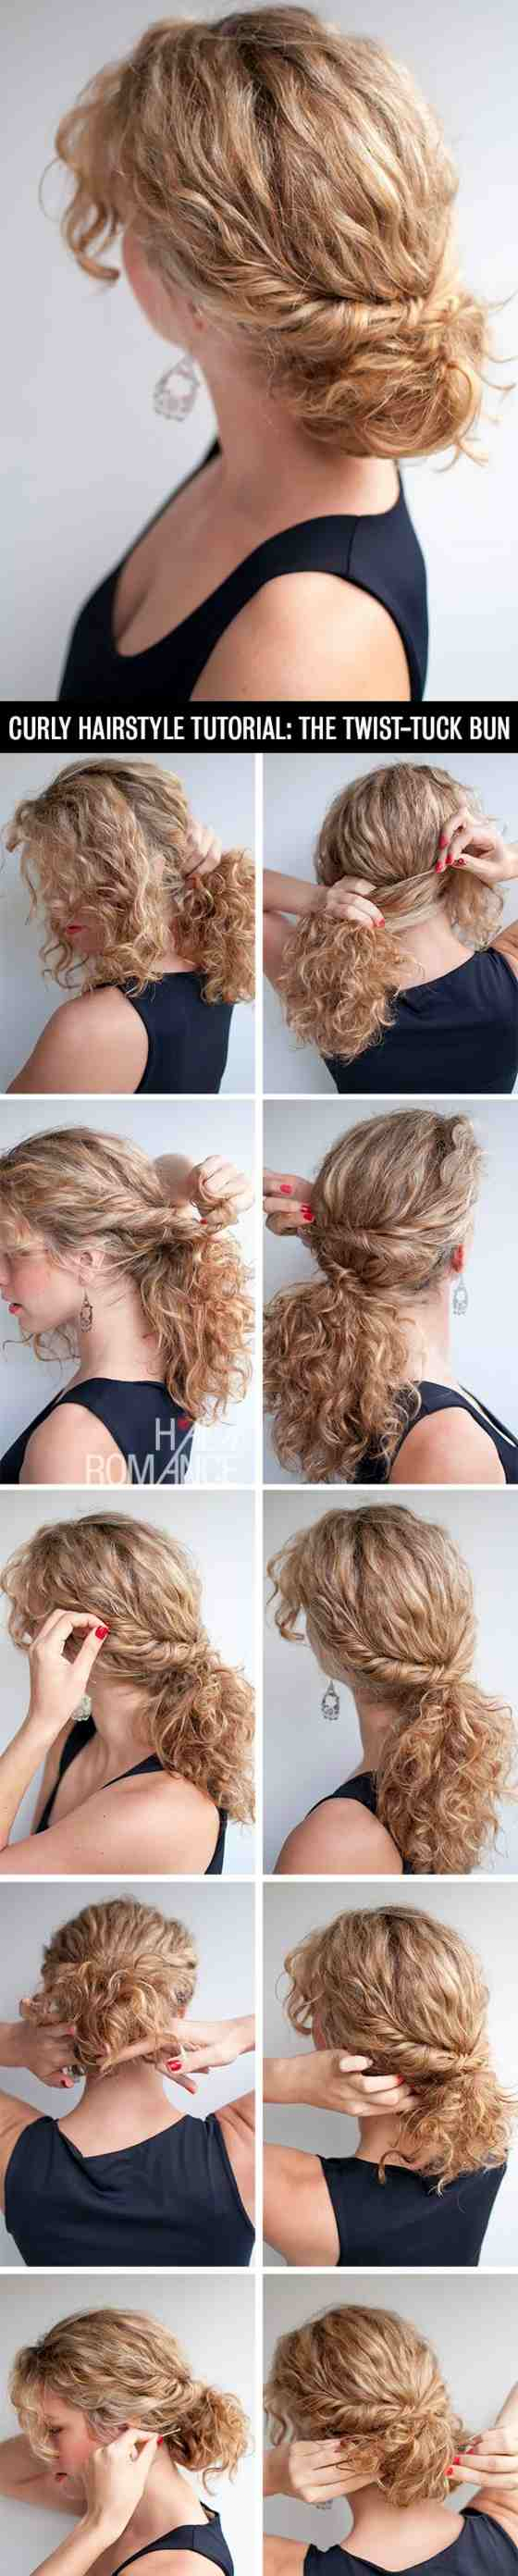 Anleitung Hochsteckfrisur Selber Machen Jpg Frisuren Bilder Hair Styles Hair Romance Curly Hair Romance